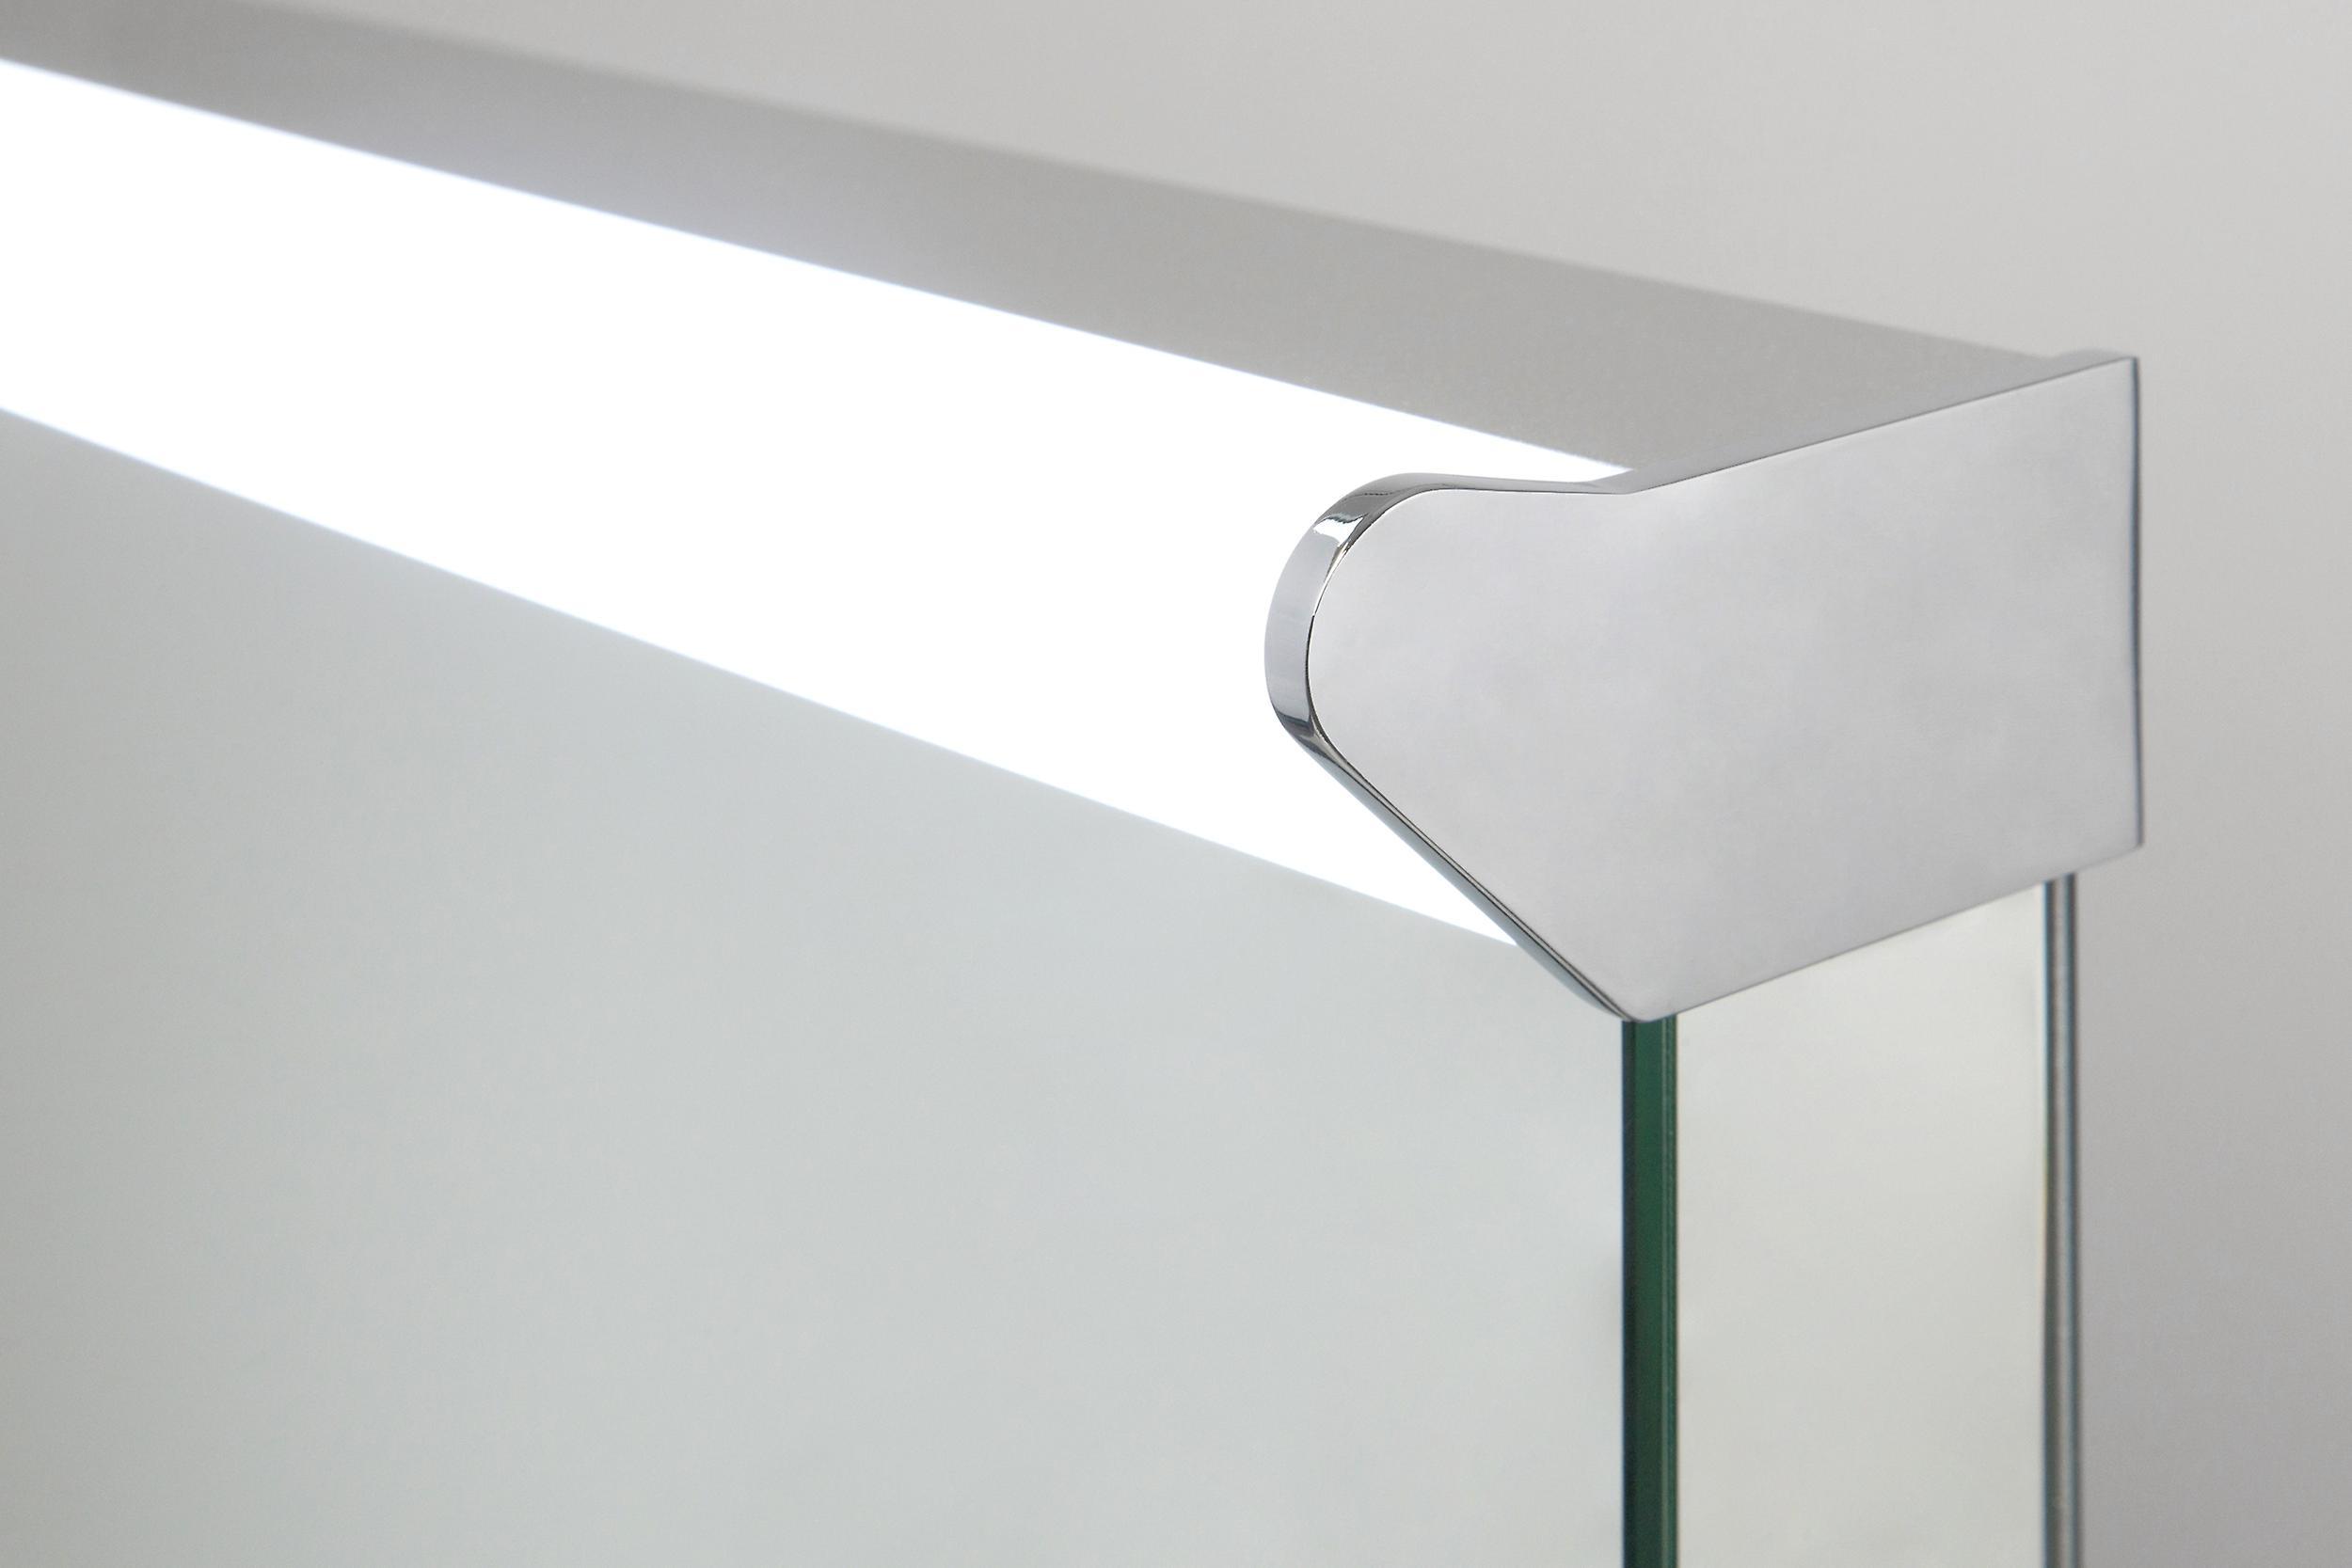 Cygnus Top Light LED Bathroom Mirror with Demister Pad & Sensor k478